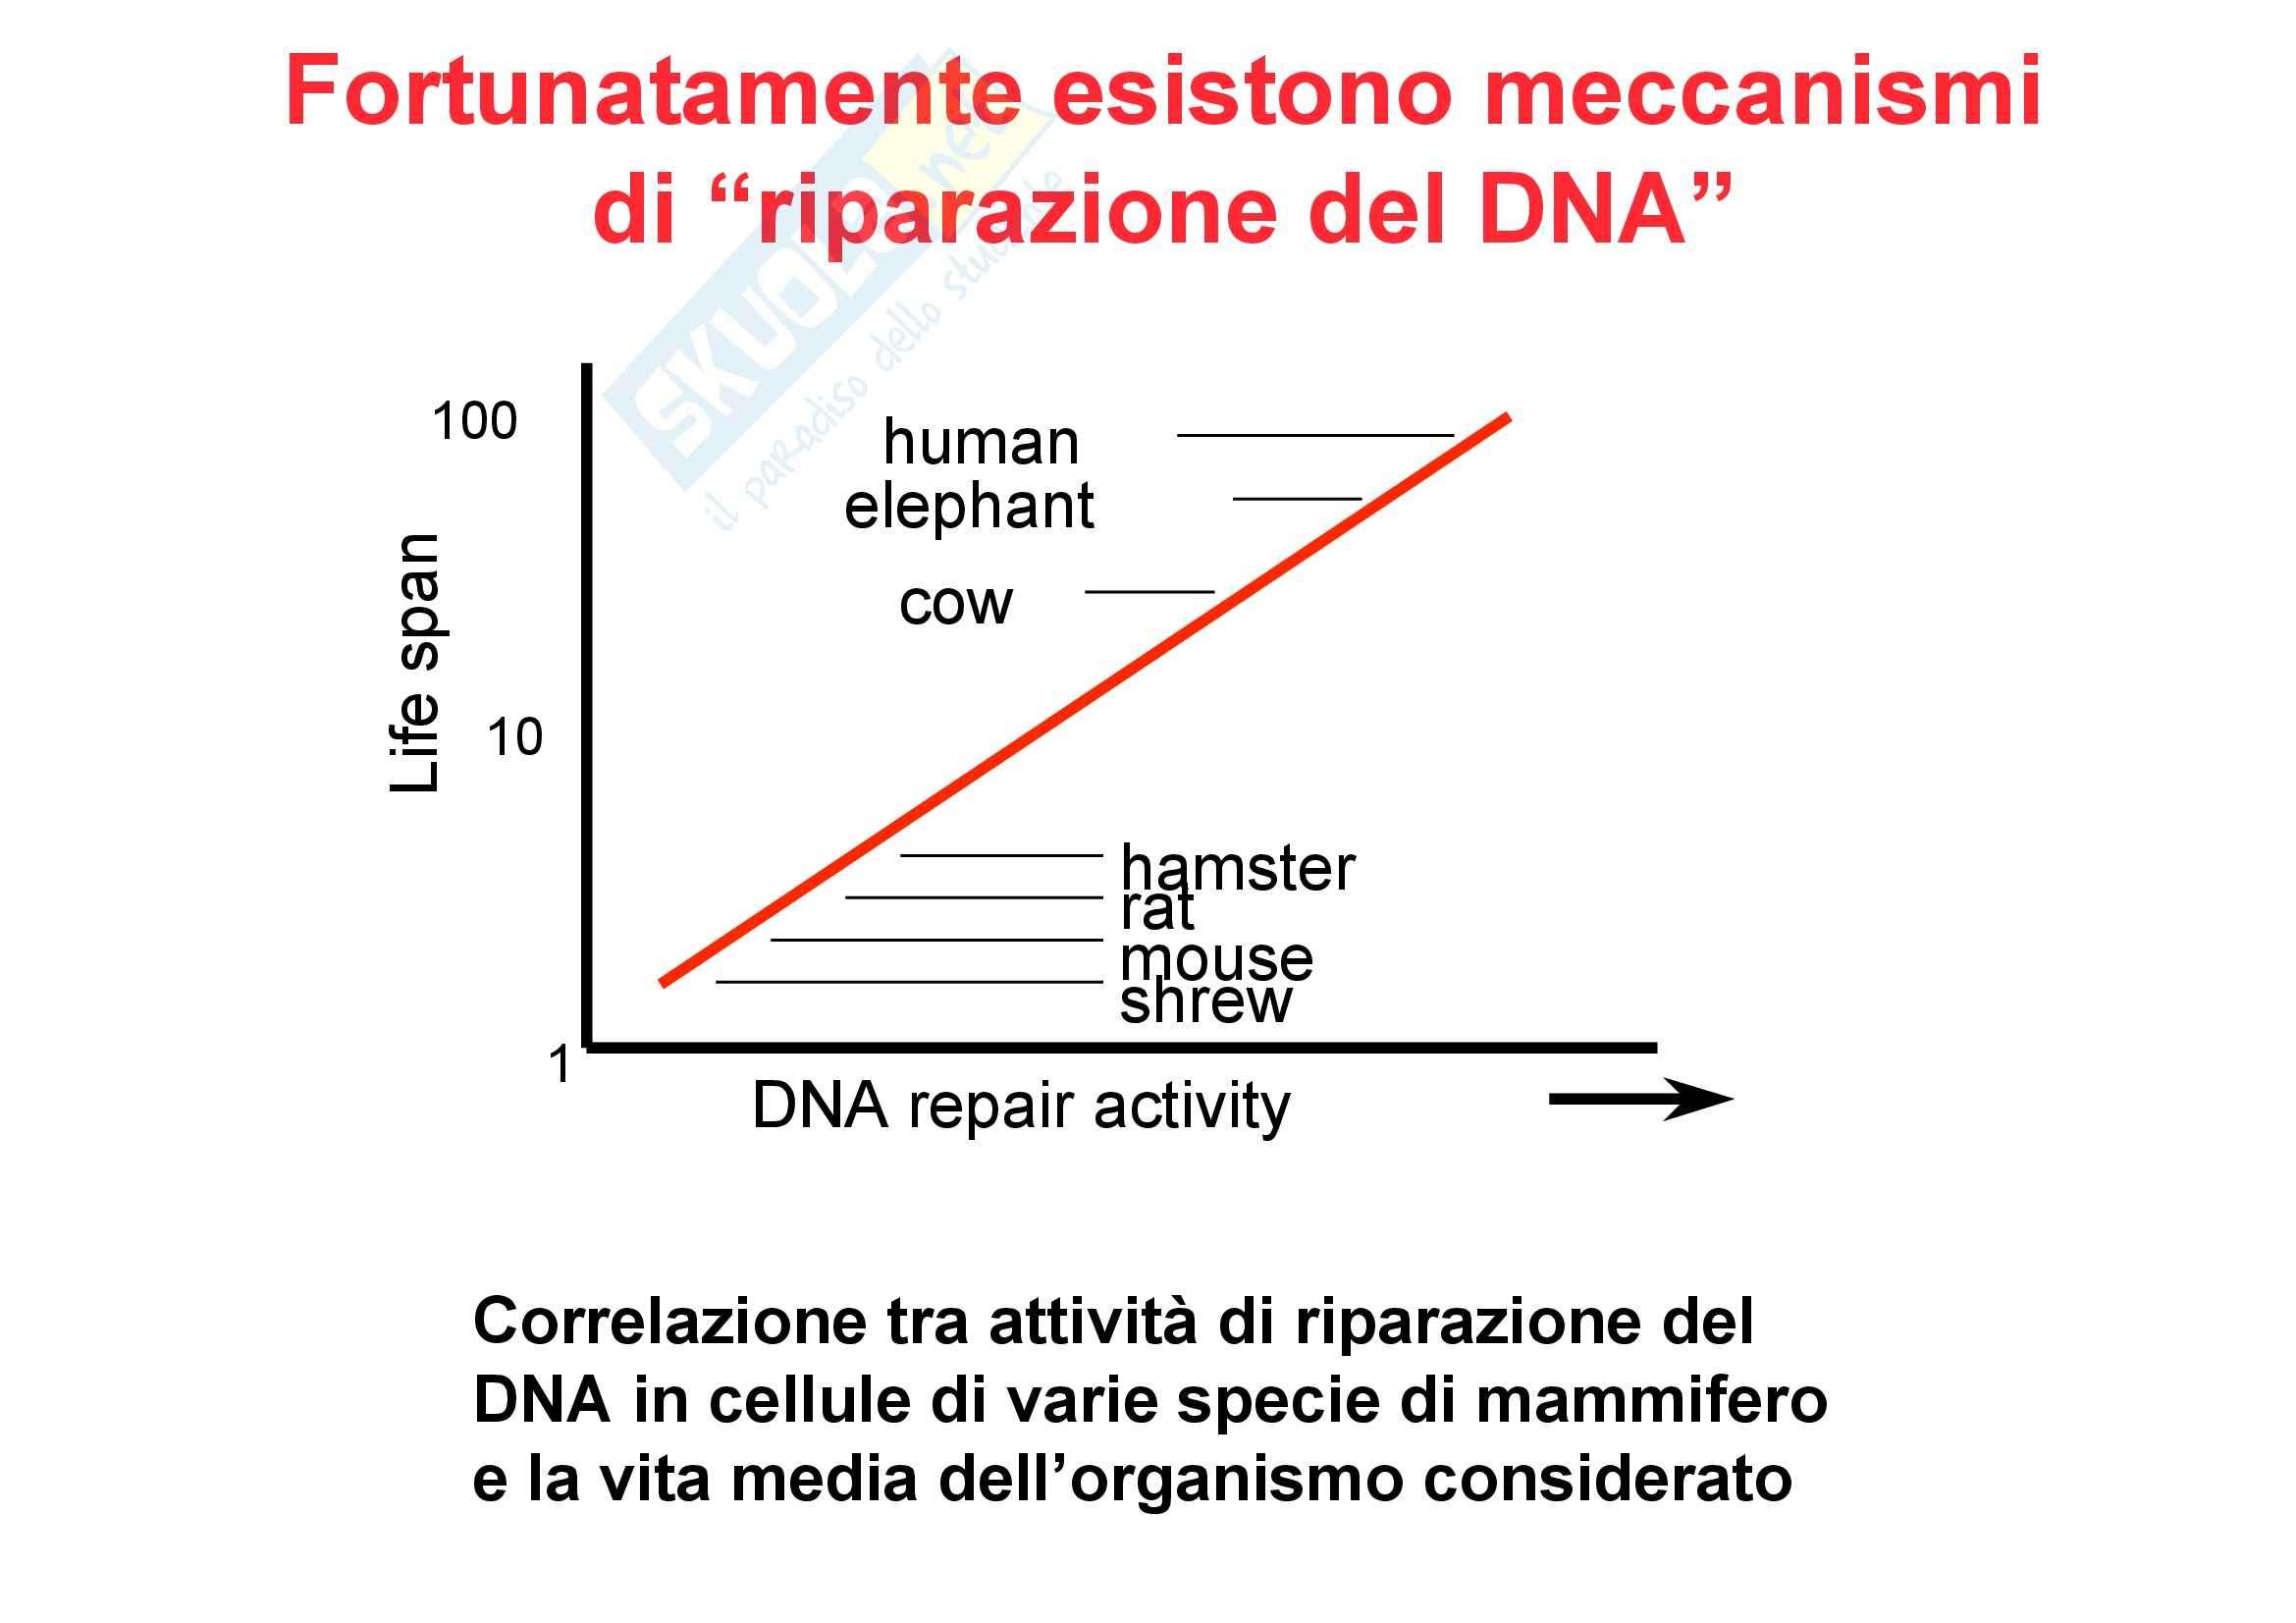 Genetica umana - alleli e Mendel - Appunti Pag. 26